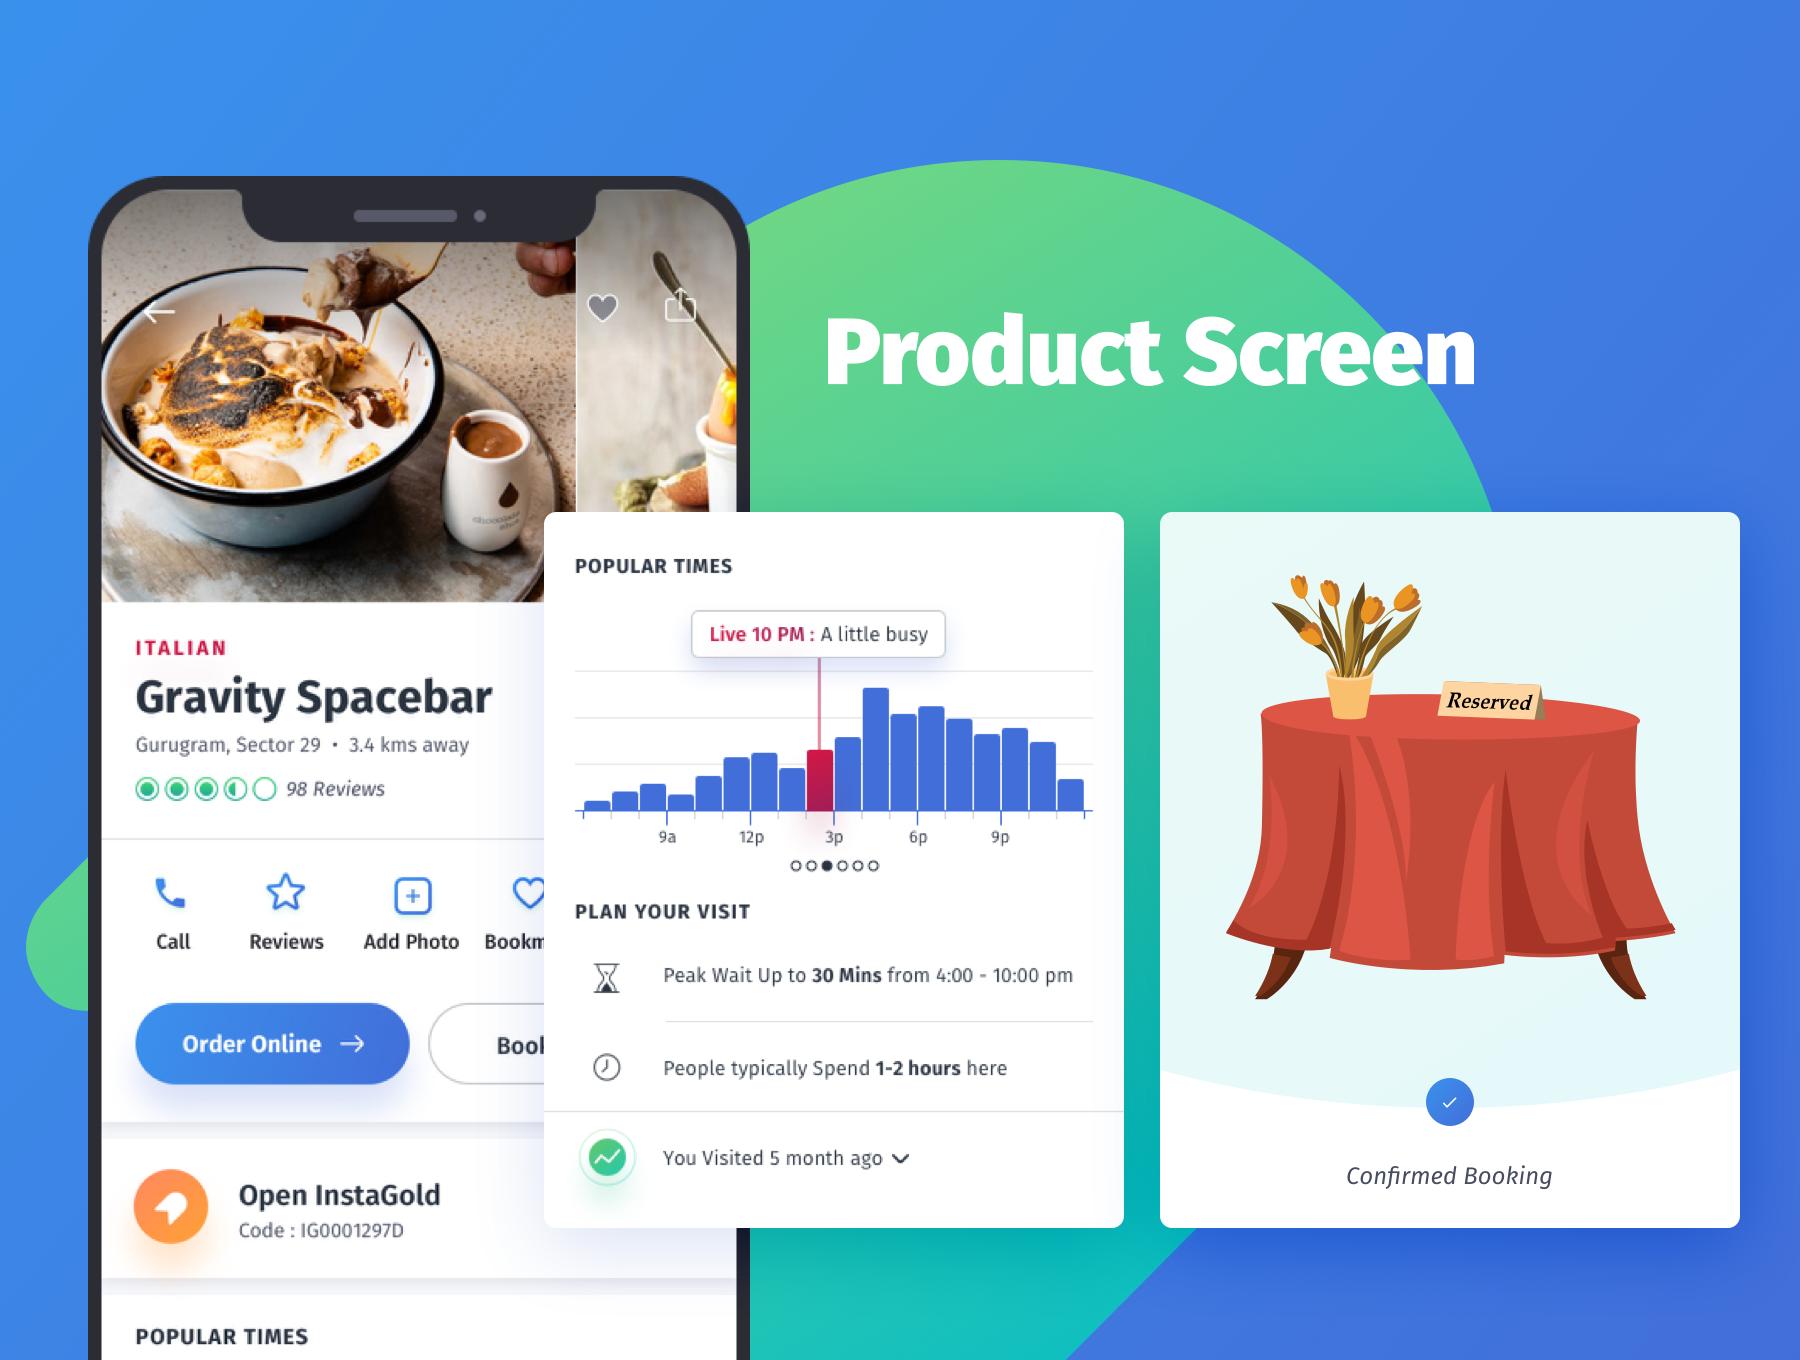 咖啡店酒店餐馆食品外卖APP应用程序UI界面设计套件 YumFood – Mobile App UI kit插图(3)